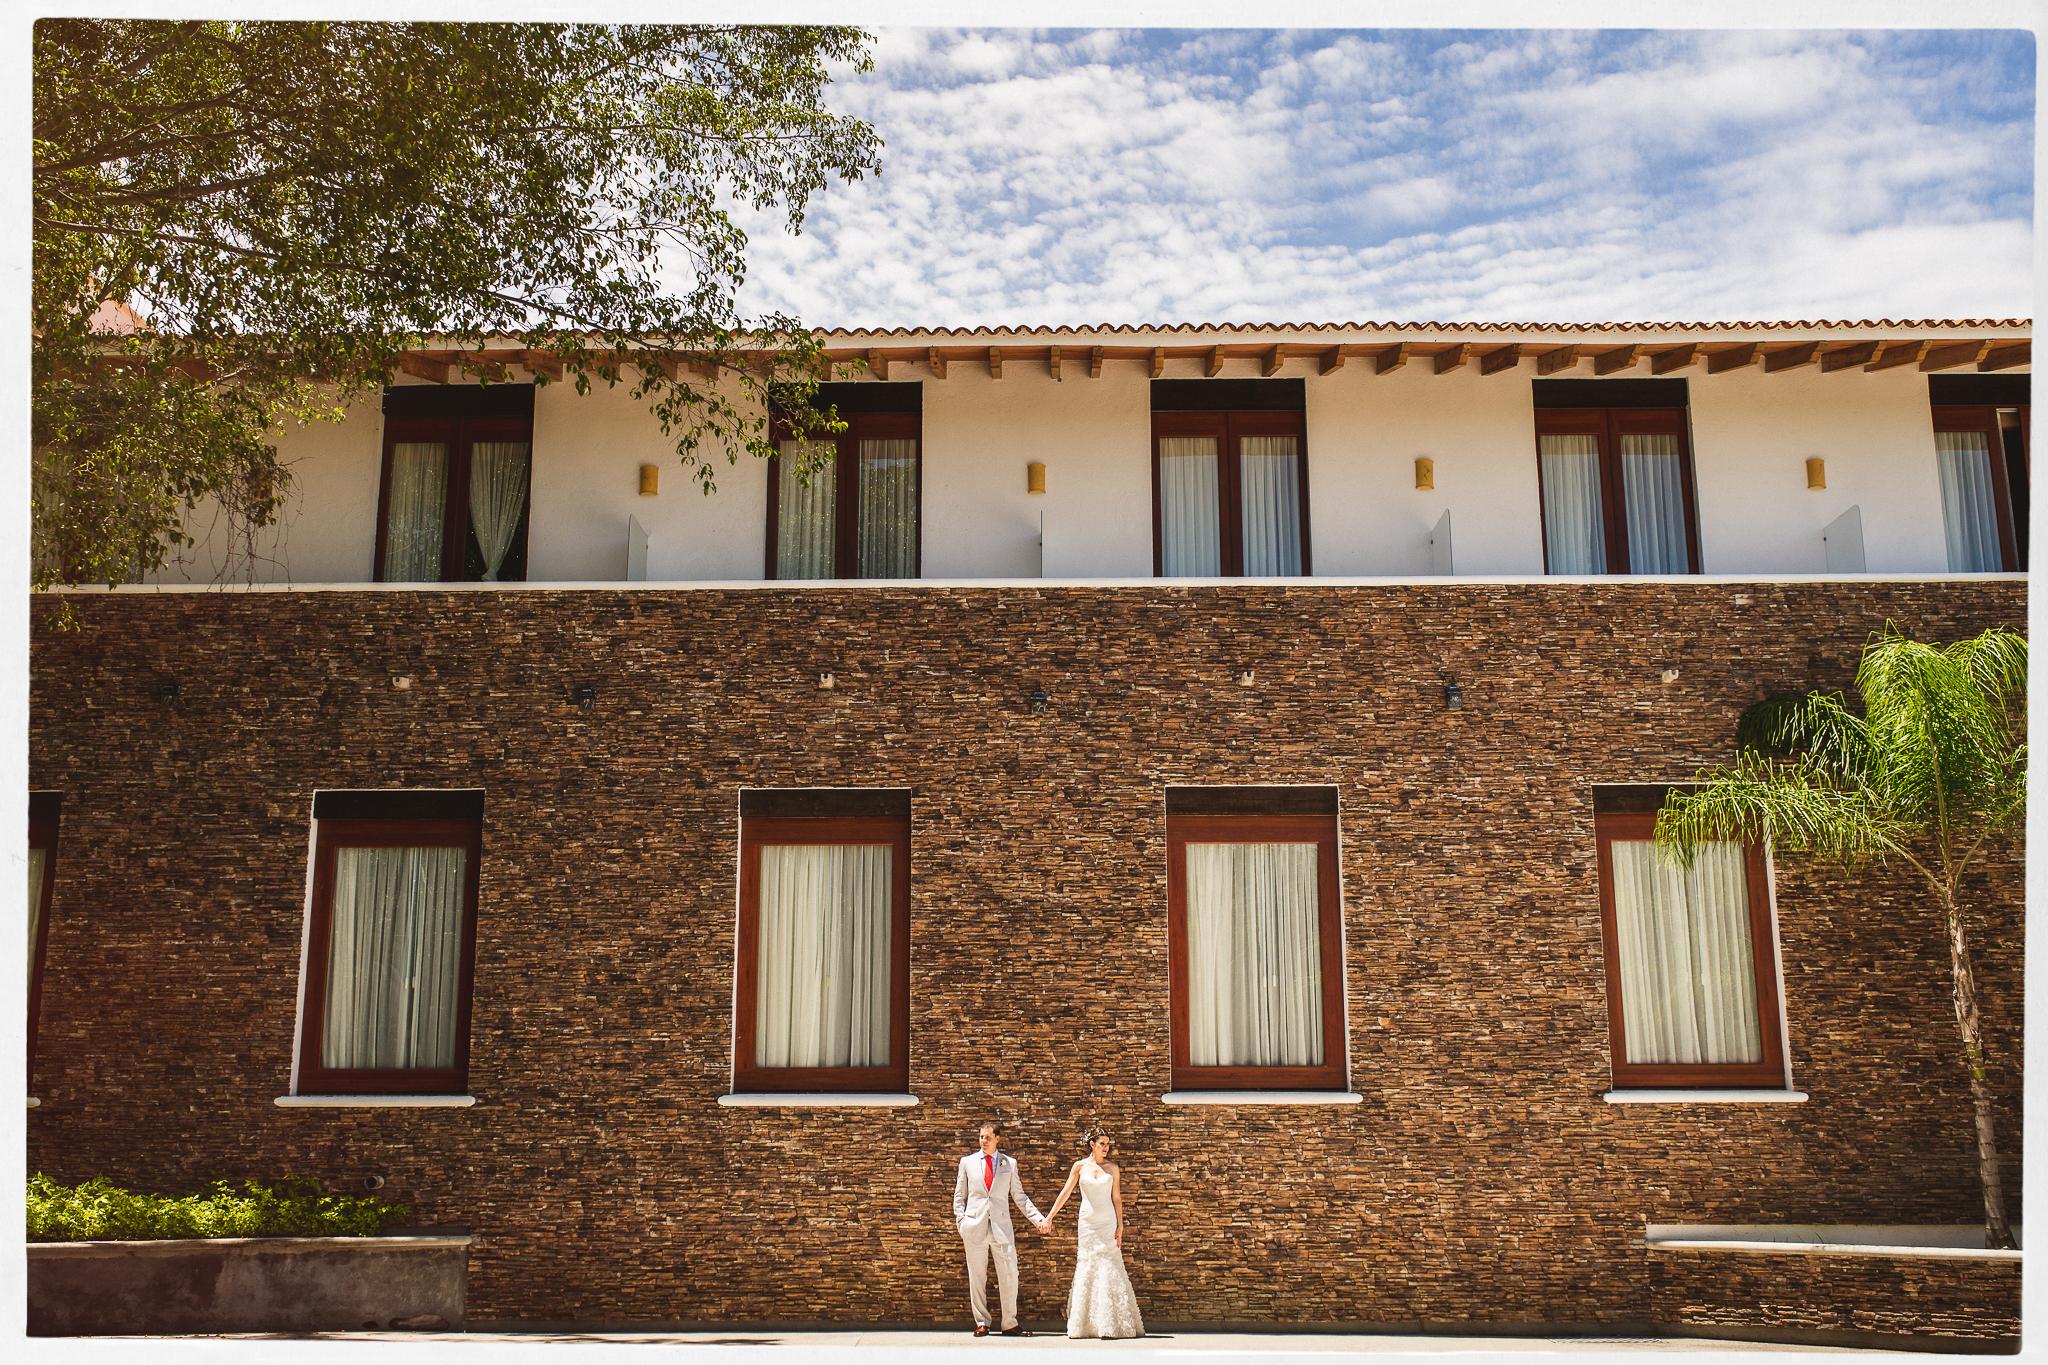 wedding-photography-mexico-quinta-rubelinas-26.jpg